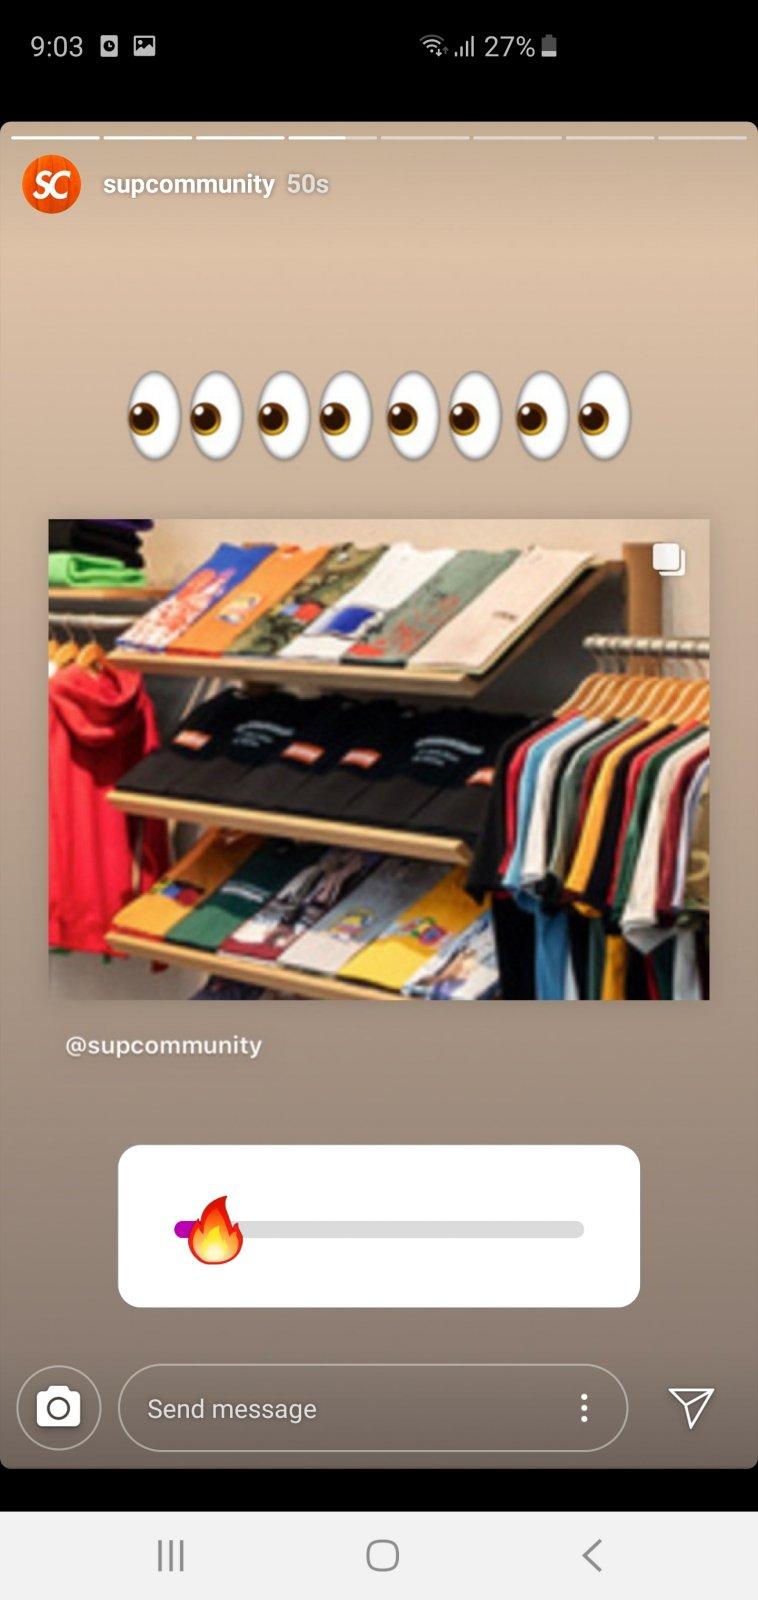 Screenshot_20191023-090357_Instagram.jpg